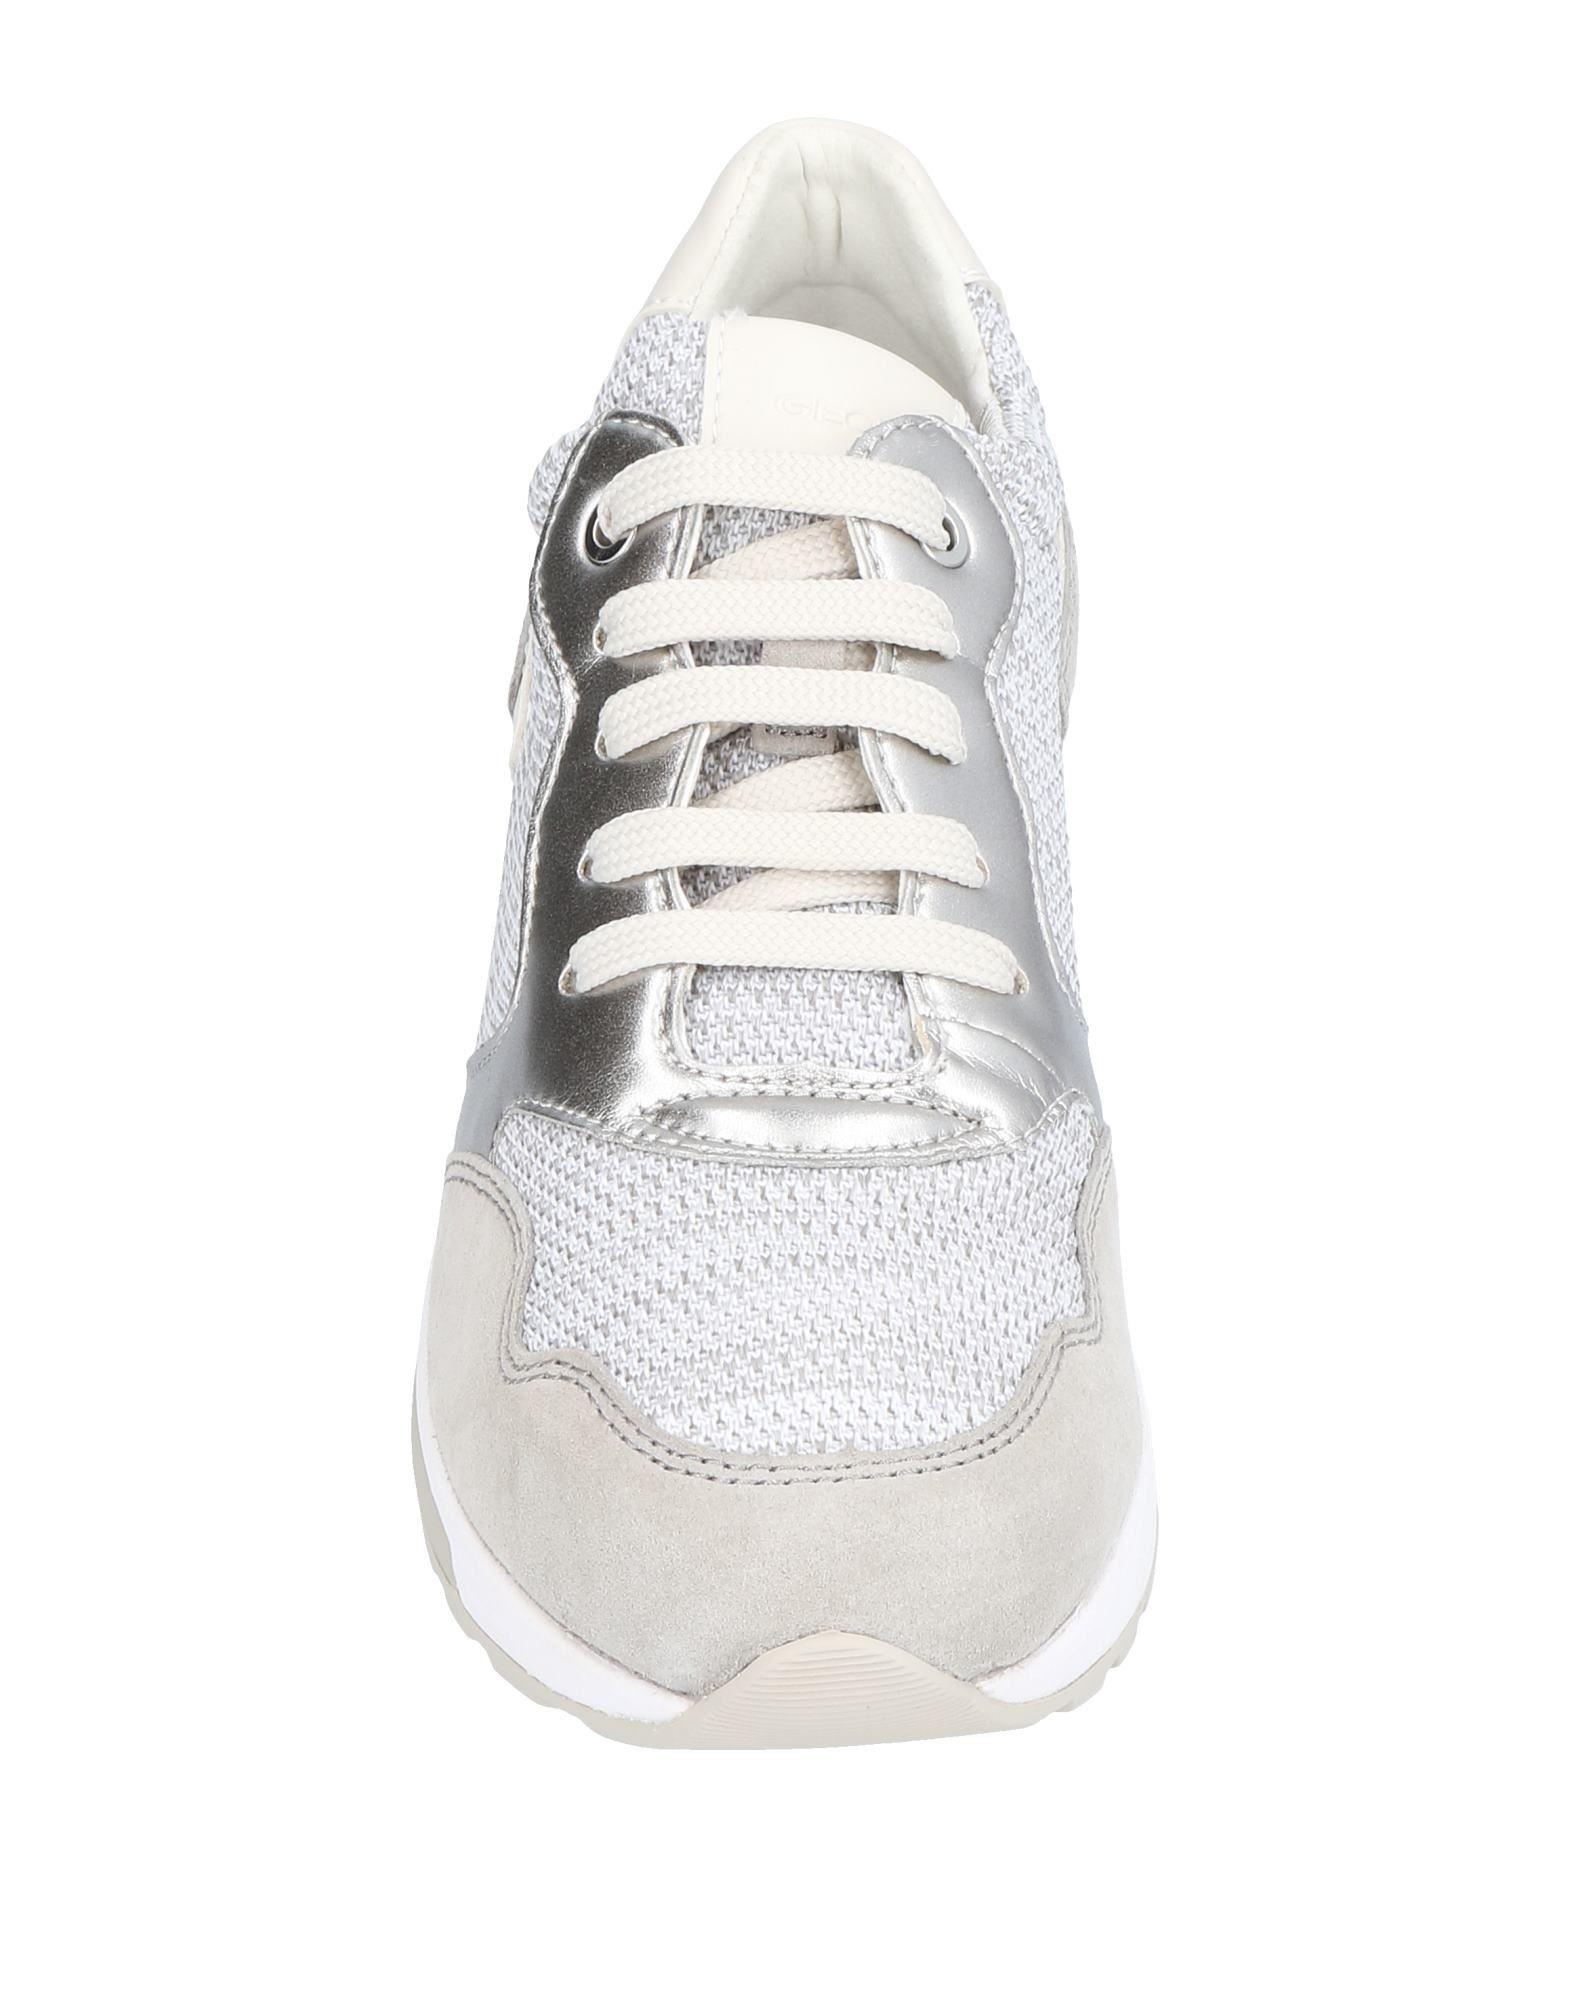 Geox Sneakers Qualität Damen  11453773IH Gute Qualität Sneakers beliebte Schuhe 6020f5